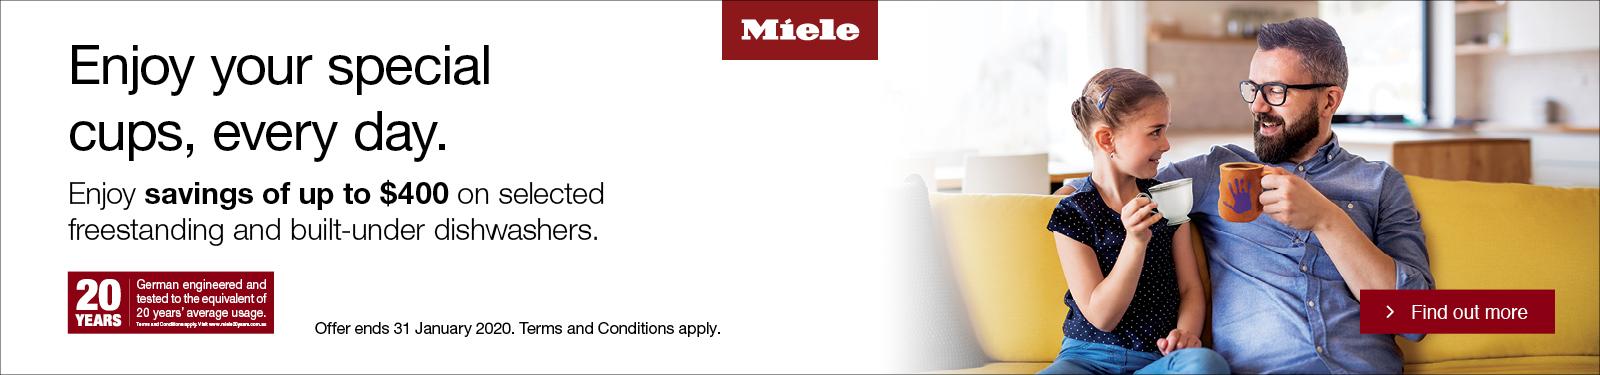 mi-8759-mca-banners-dishwasher-dec19-v1-1600x375.jpg